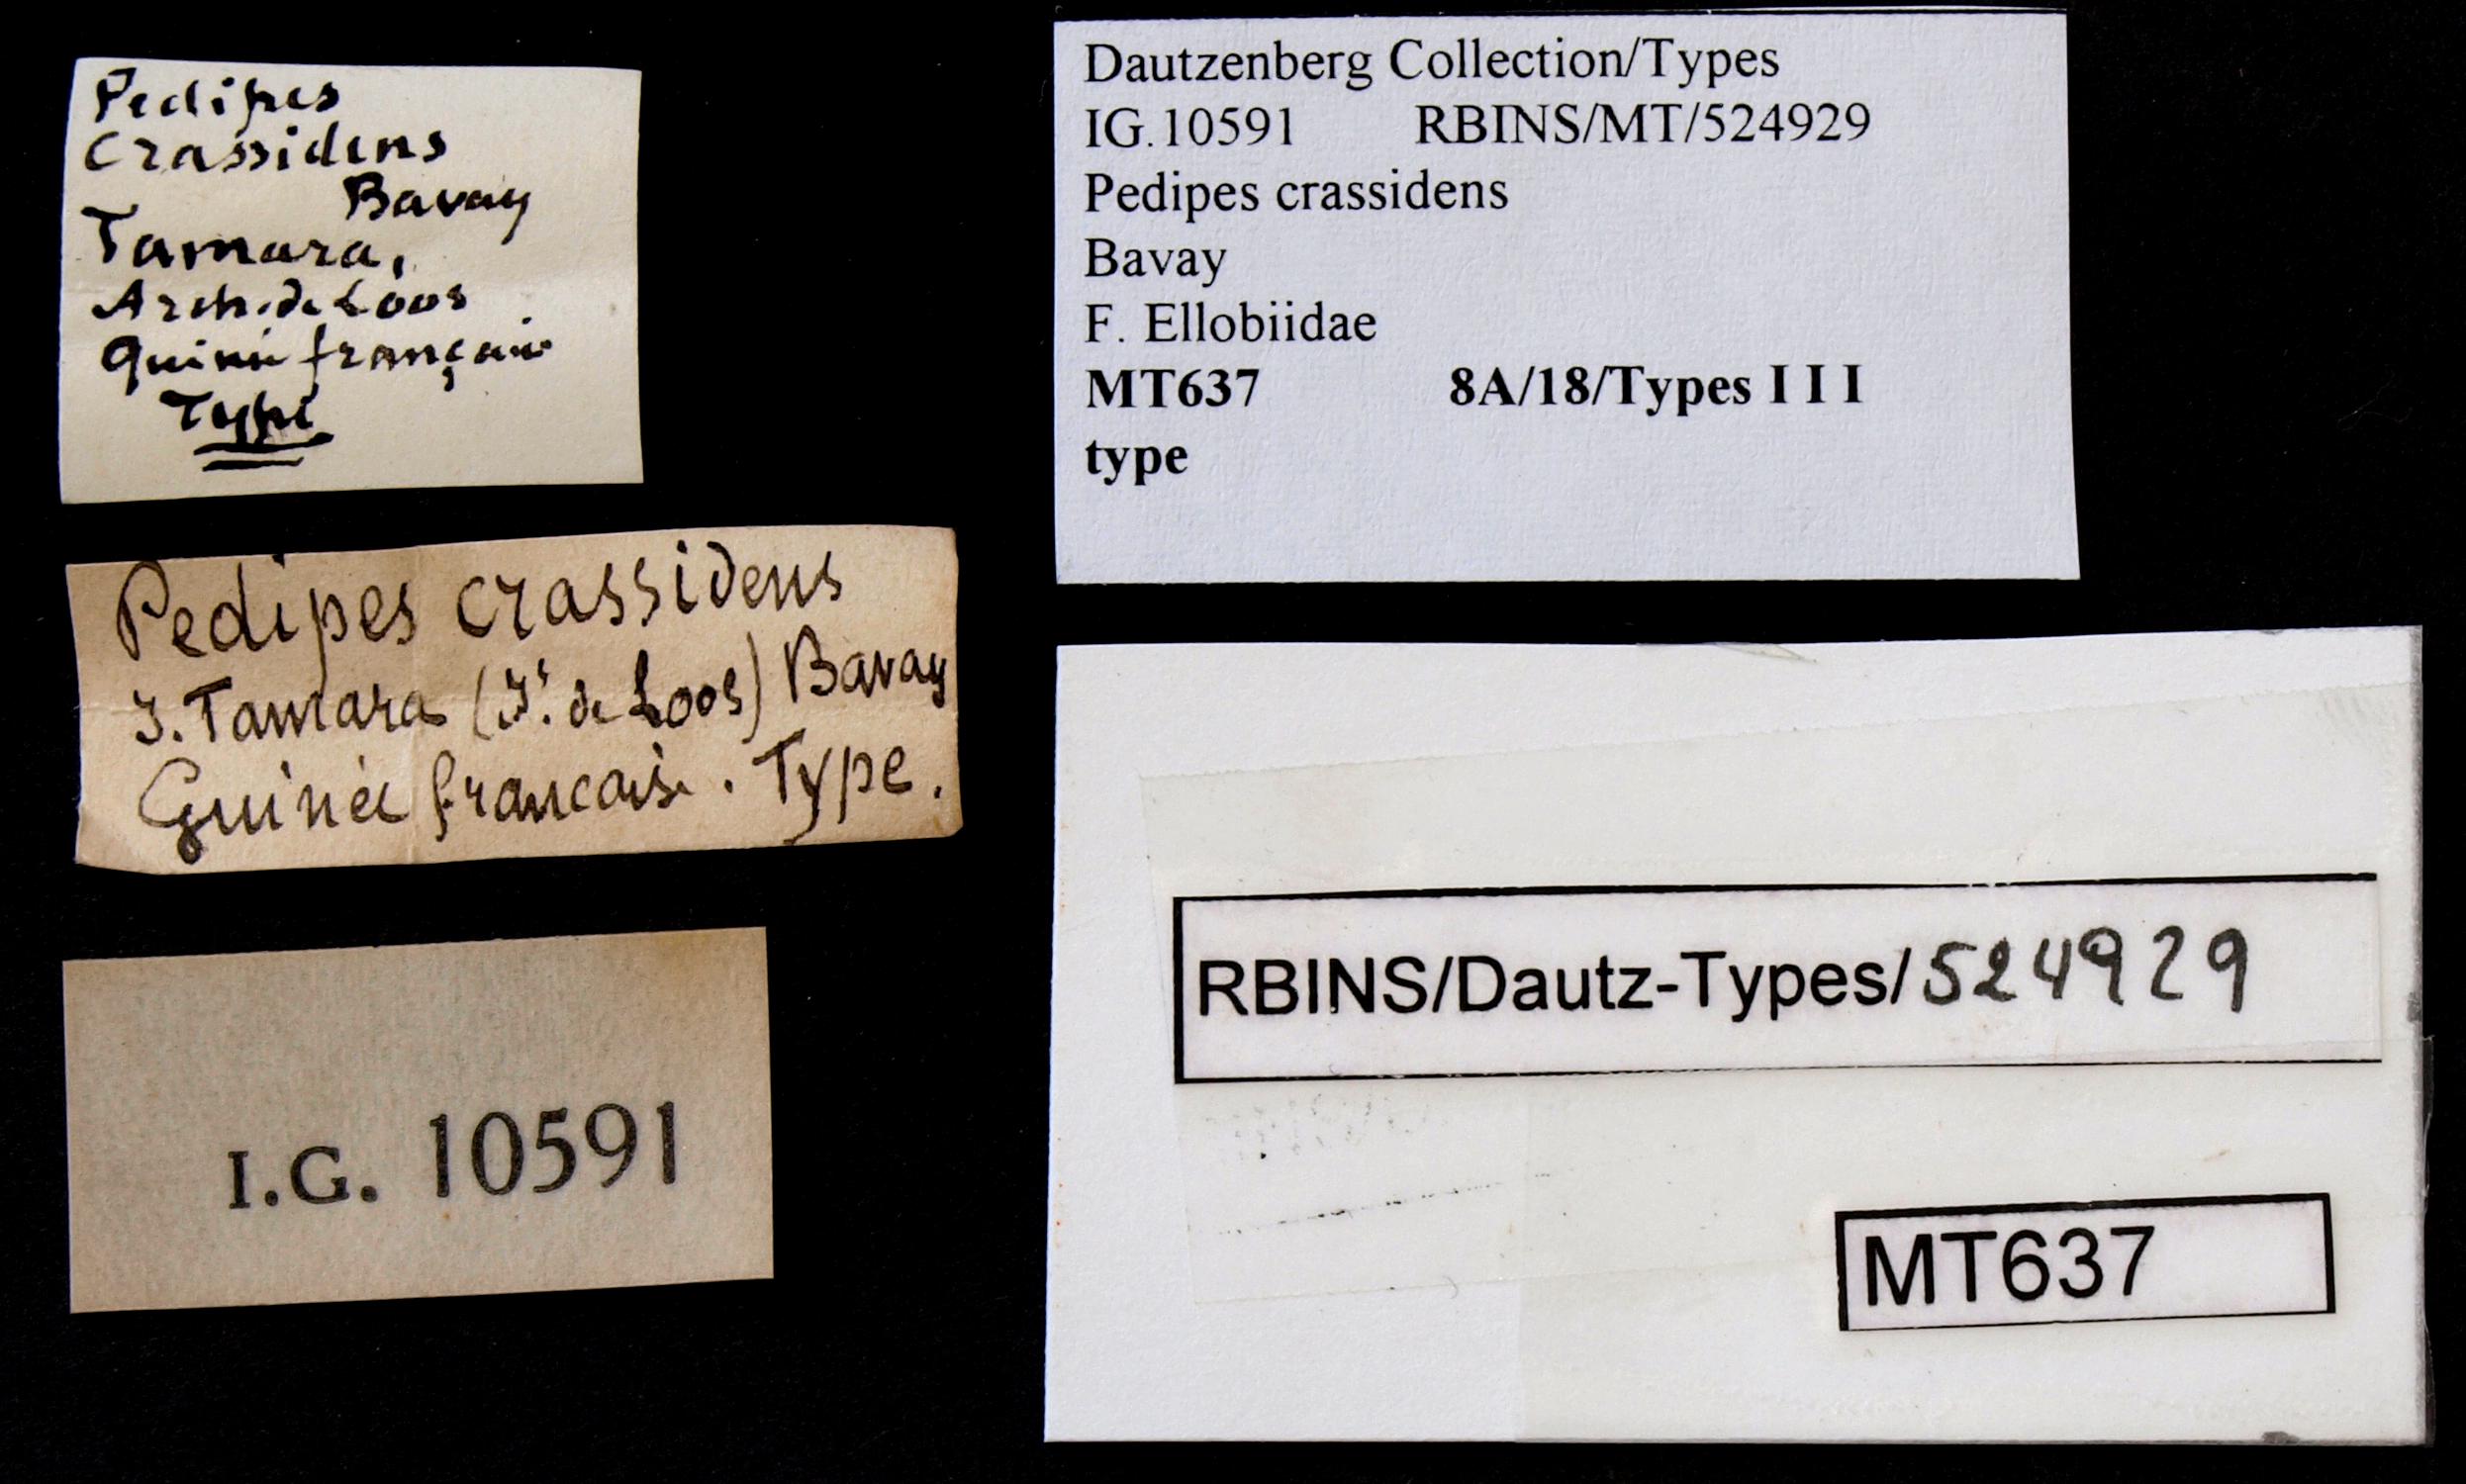 BE-RBINS-INV MT 637 Pedipes crassidens Type Lb.jpg